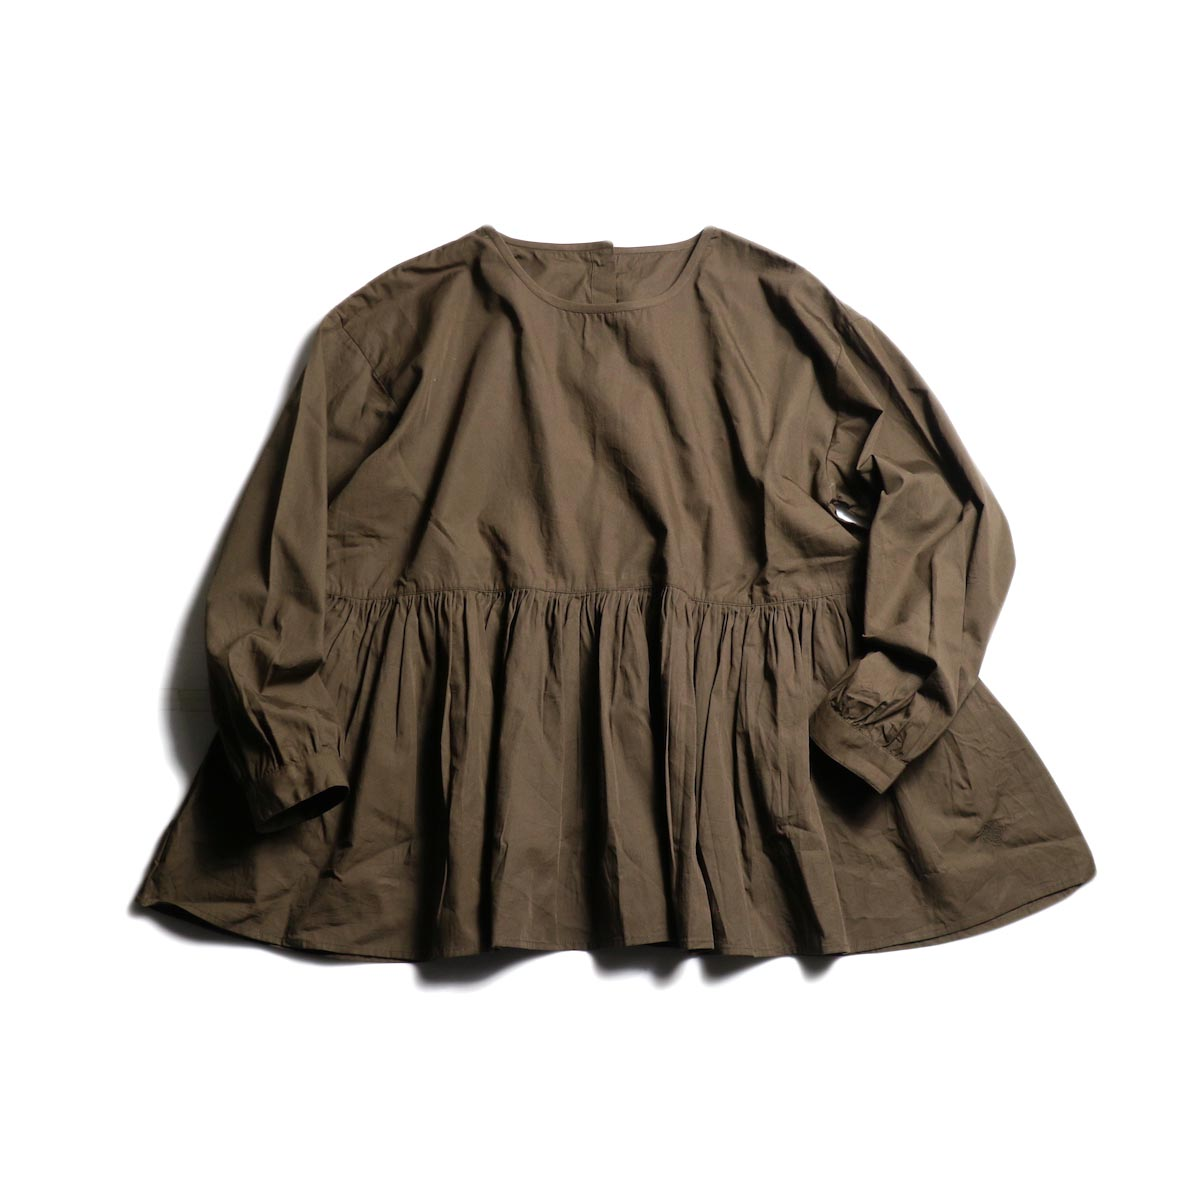 maison de soil / Rajasthan Gathered Shirt Pullover (2Way) -Brown